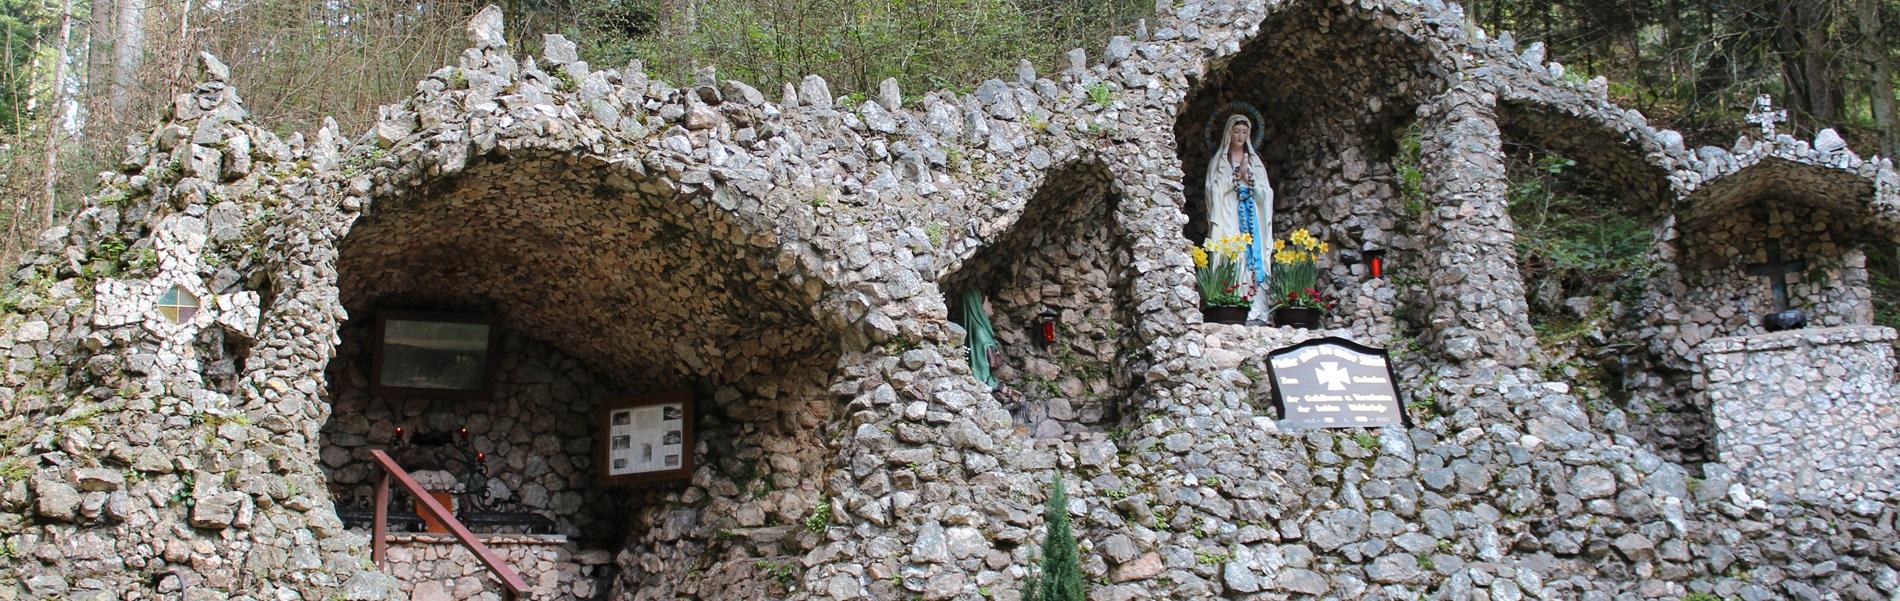 Lourdes Grotte Zuwald Oberharmersbach